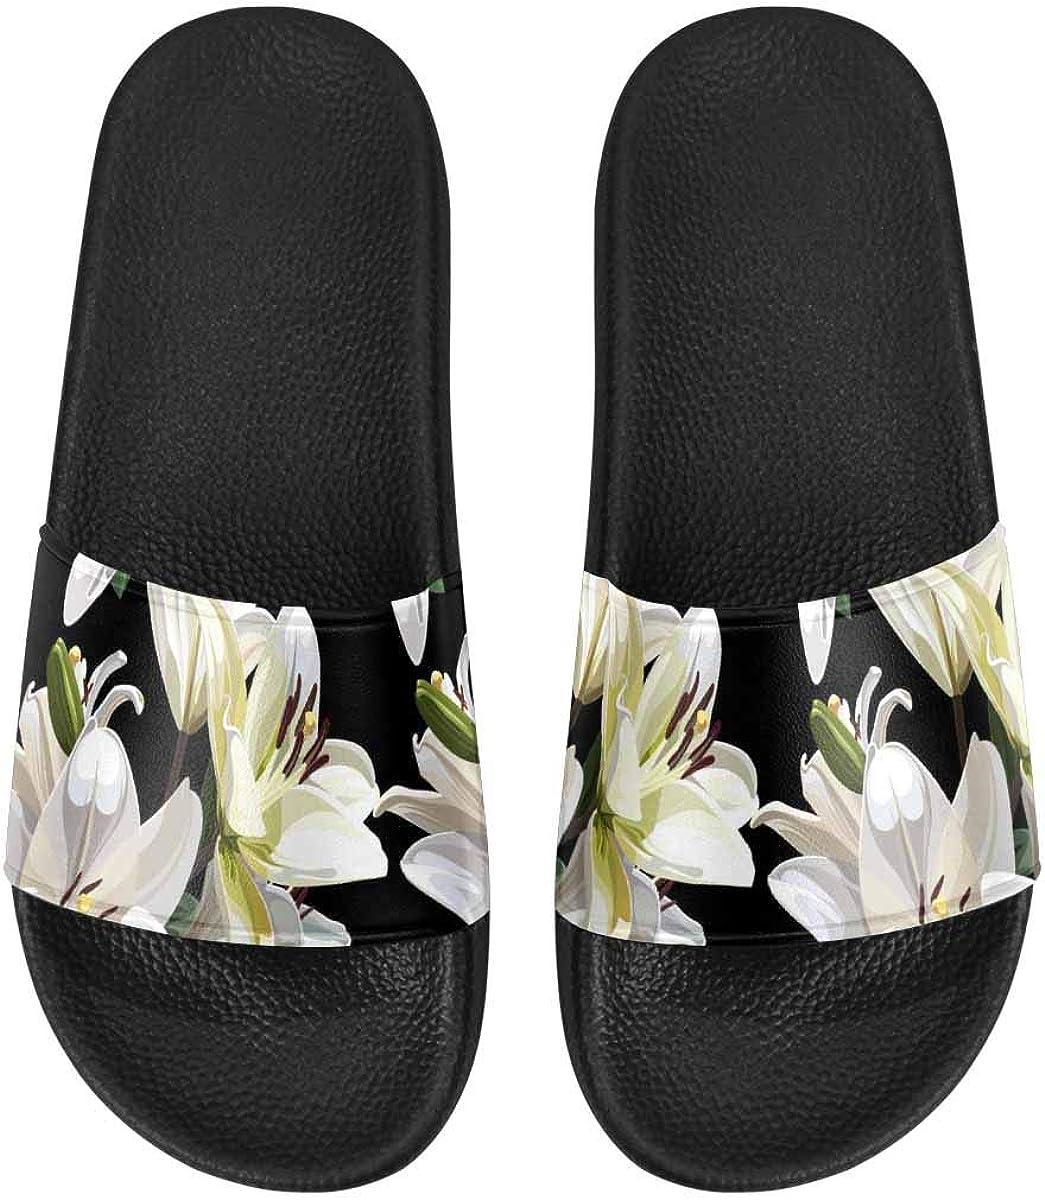 InterestPrint Women's Stylish Slipper Sandals Made from Soft Material Tropical Flower Pattern